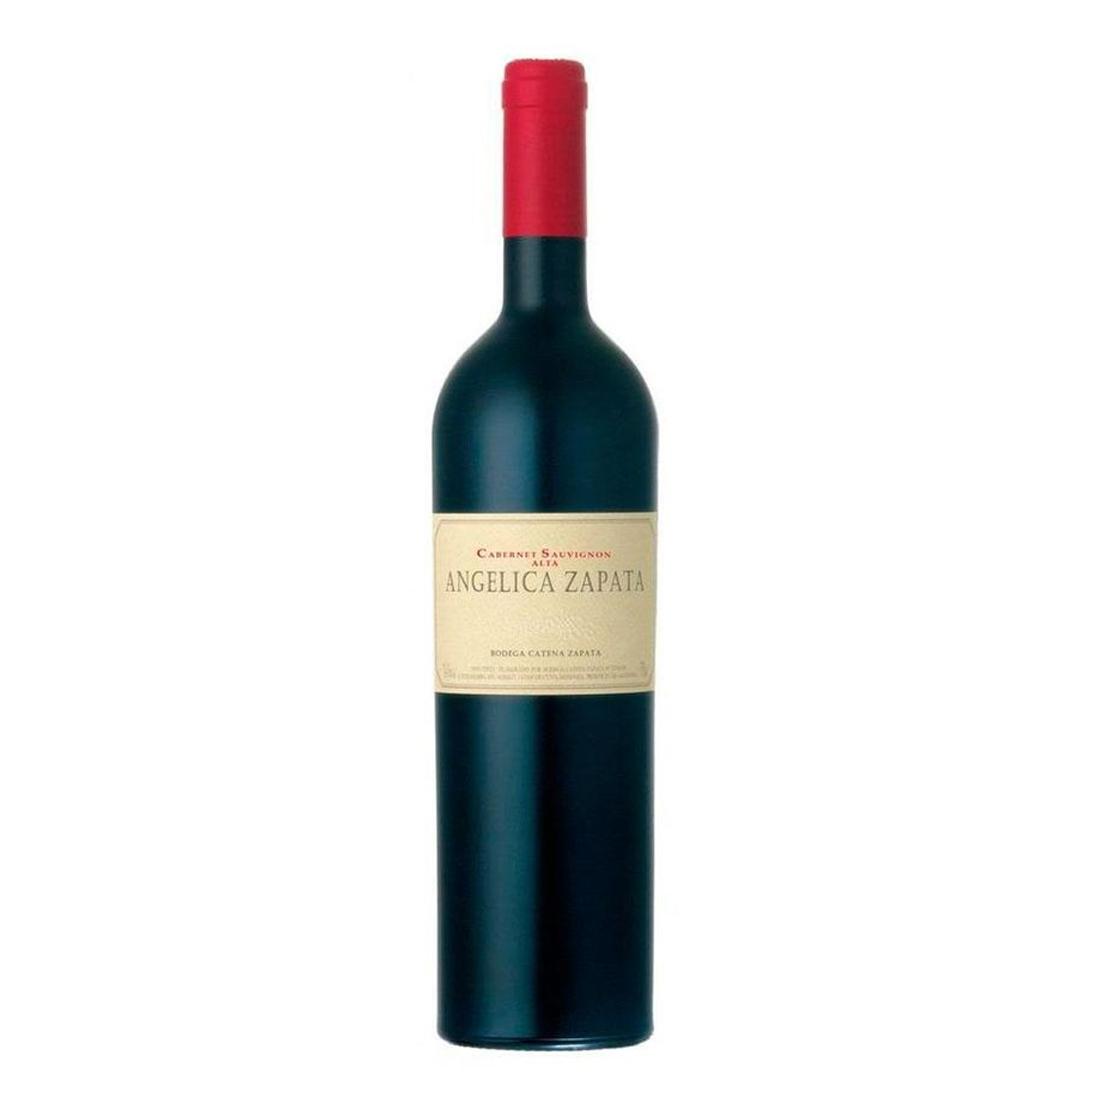 Vinho Angelica Zapata Cabernet Sauvignon 750 ml